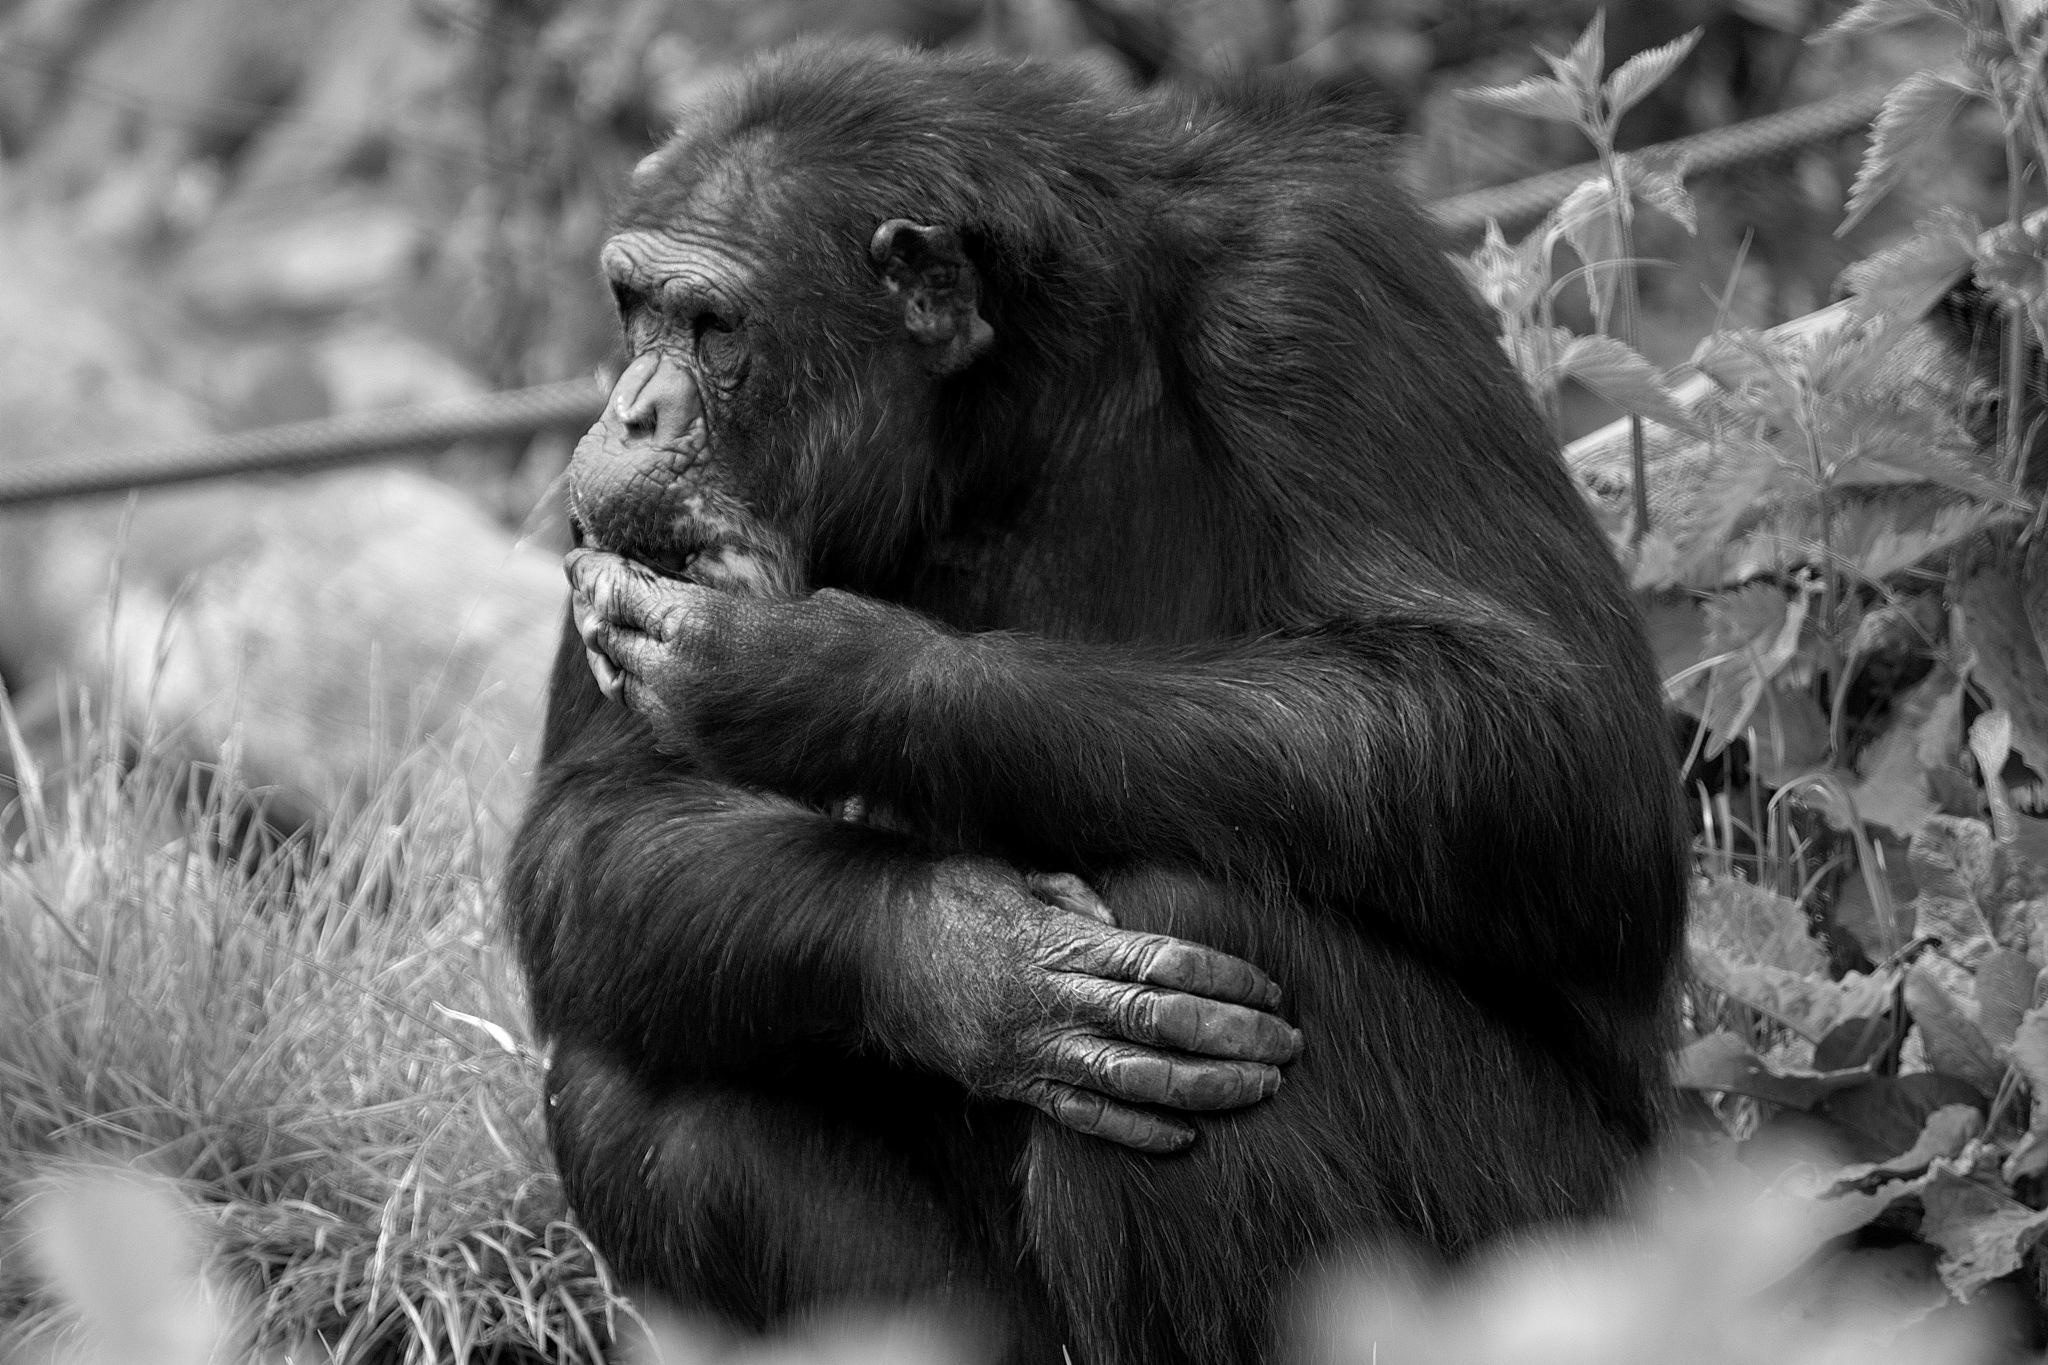 Zoo 2 by Mogens